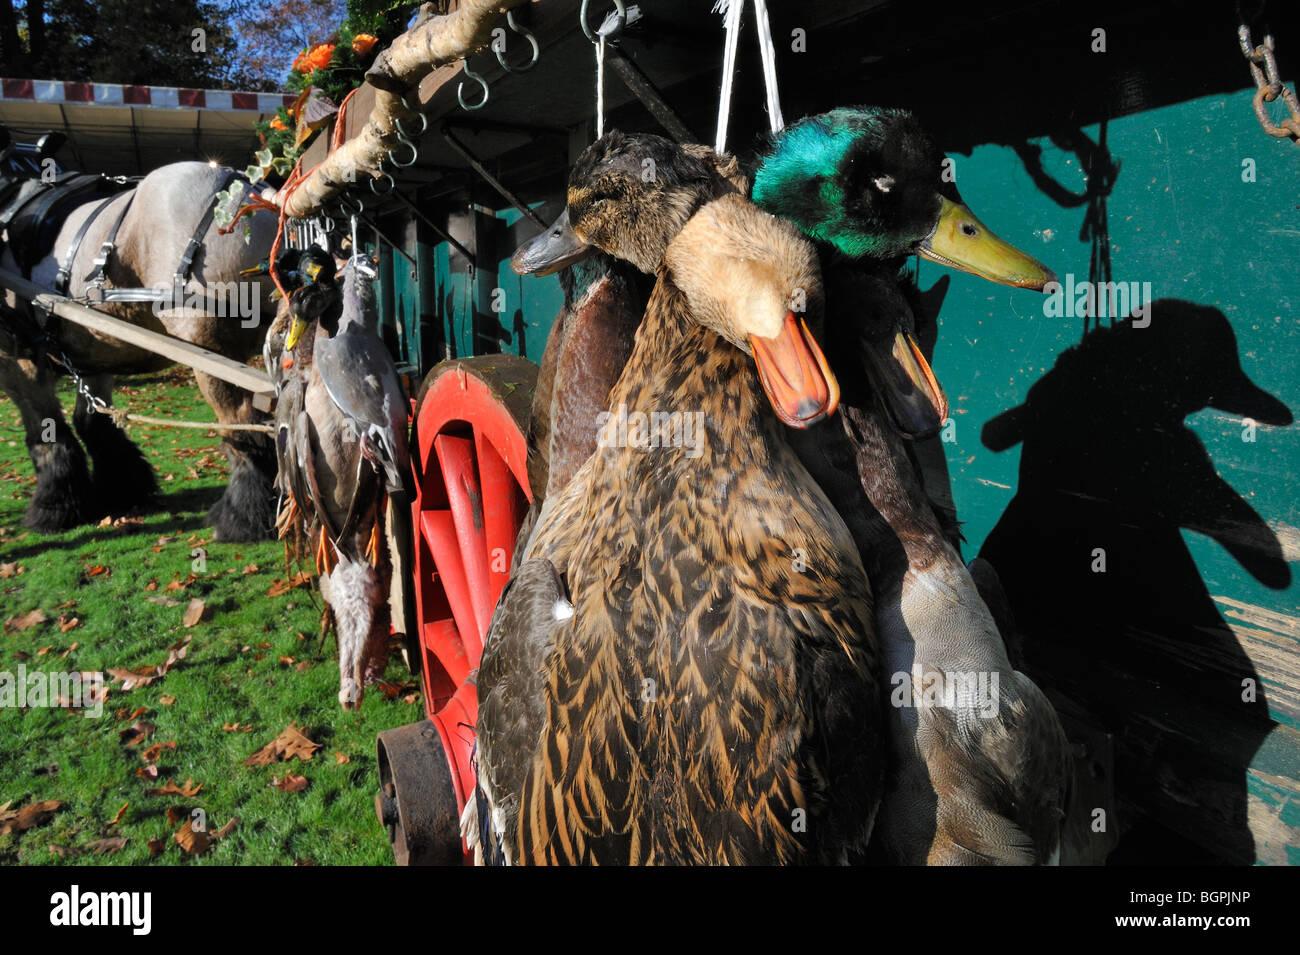 Cart with hunting game - mallard, wood pigeon, pheasant, hare - during the commemoration of Saint Hubert / Hubertus, - Stock Image